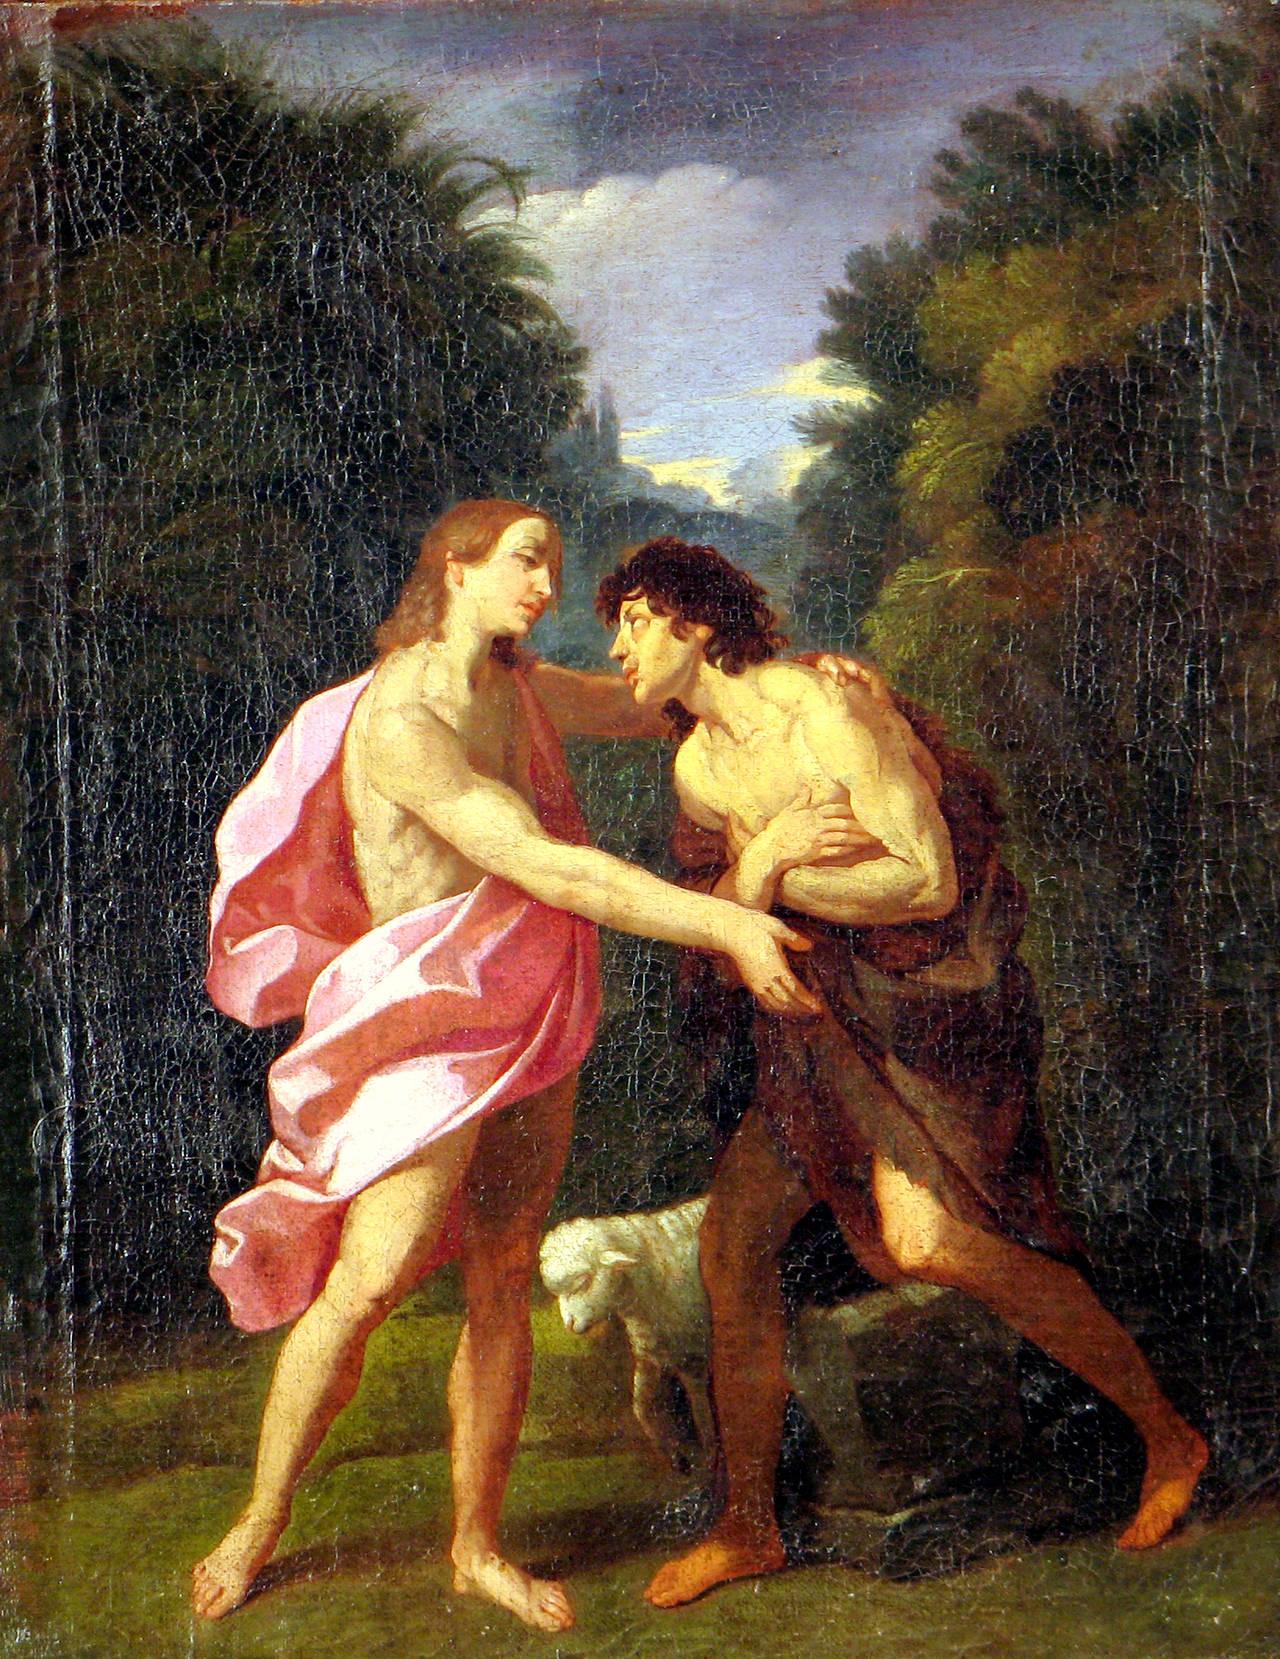 Jesus and Saint John the Baptist 2